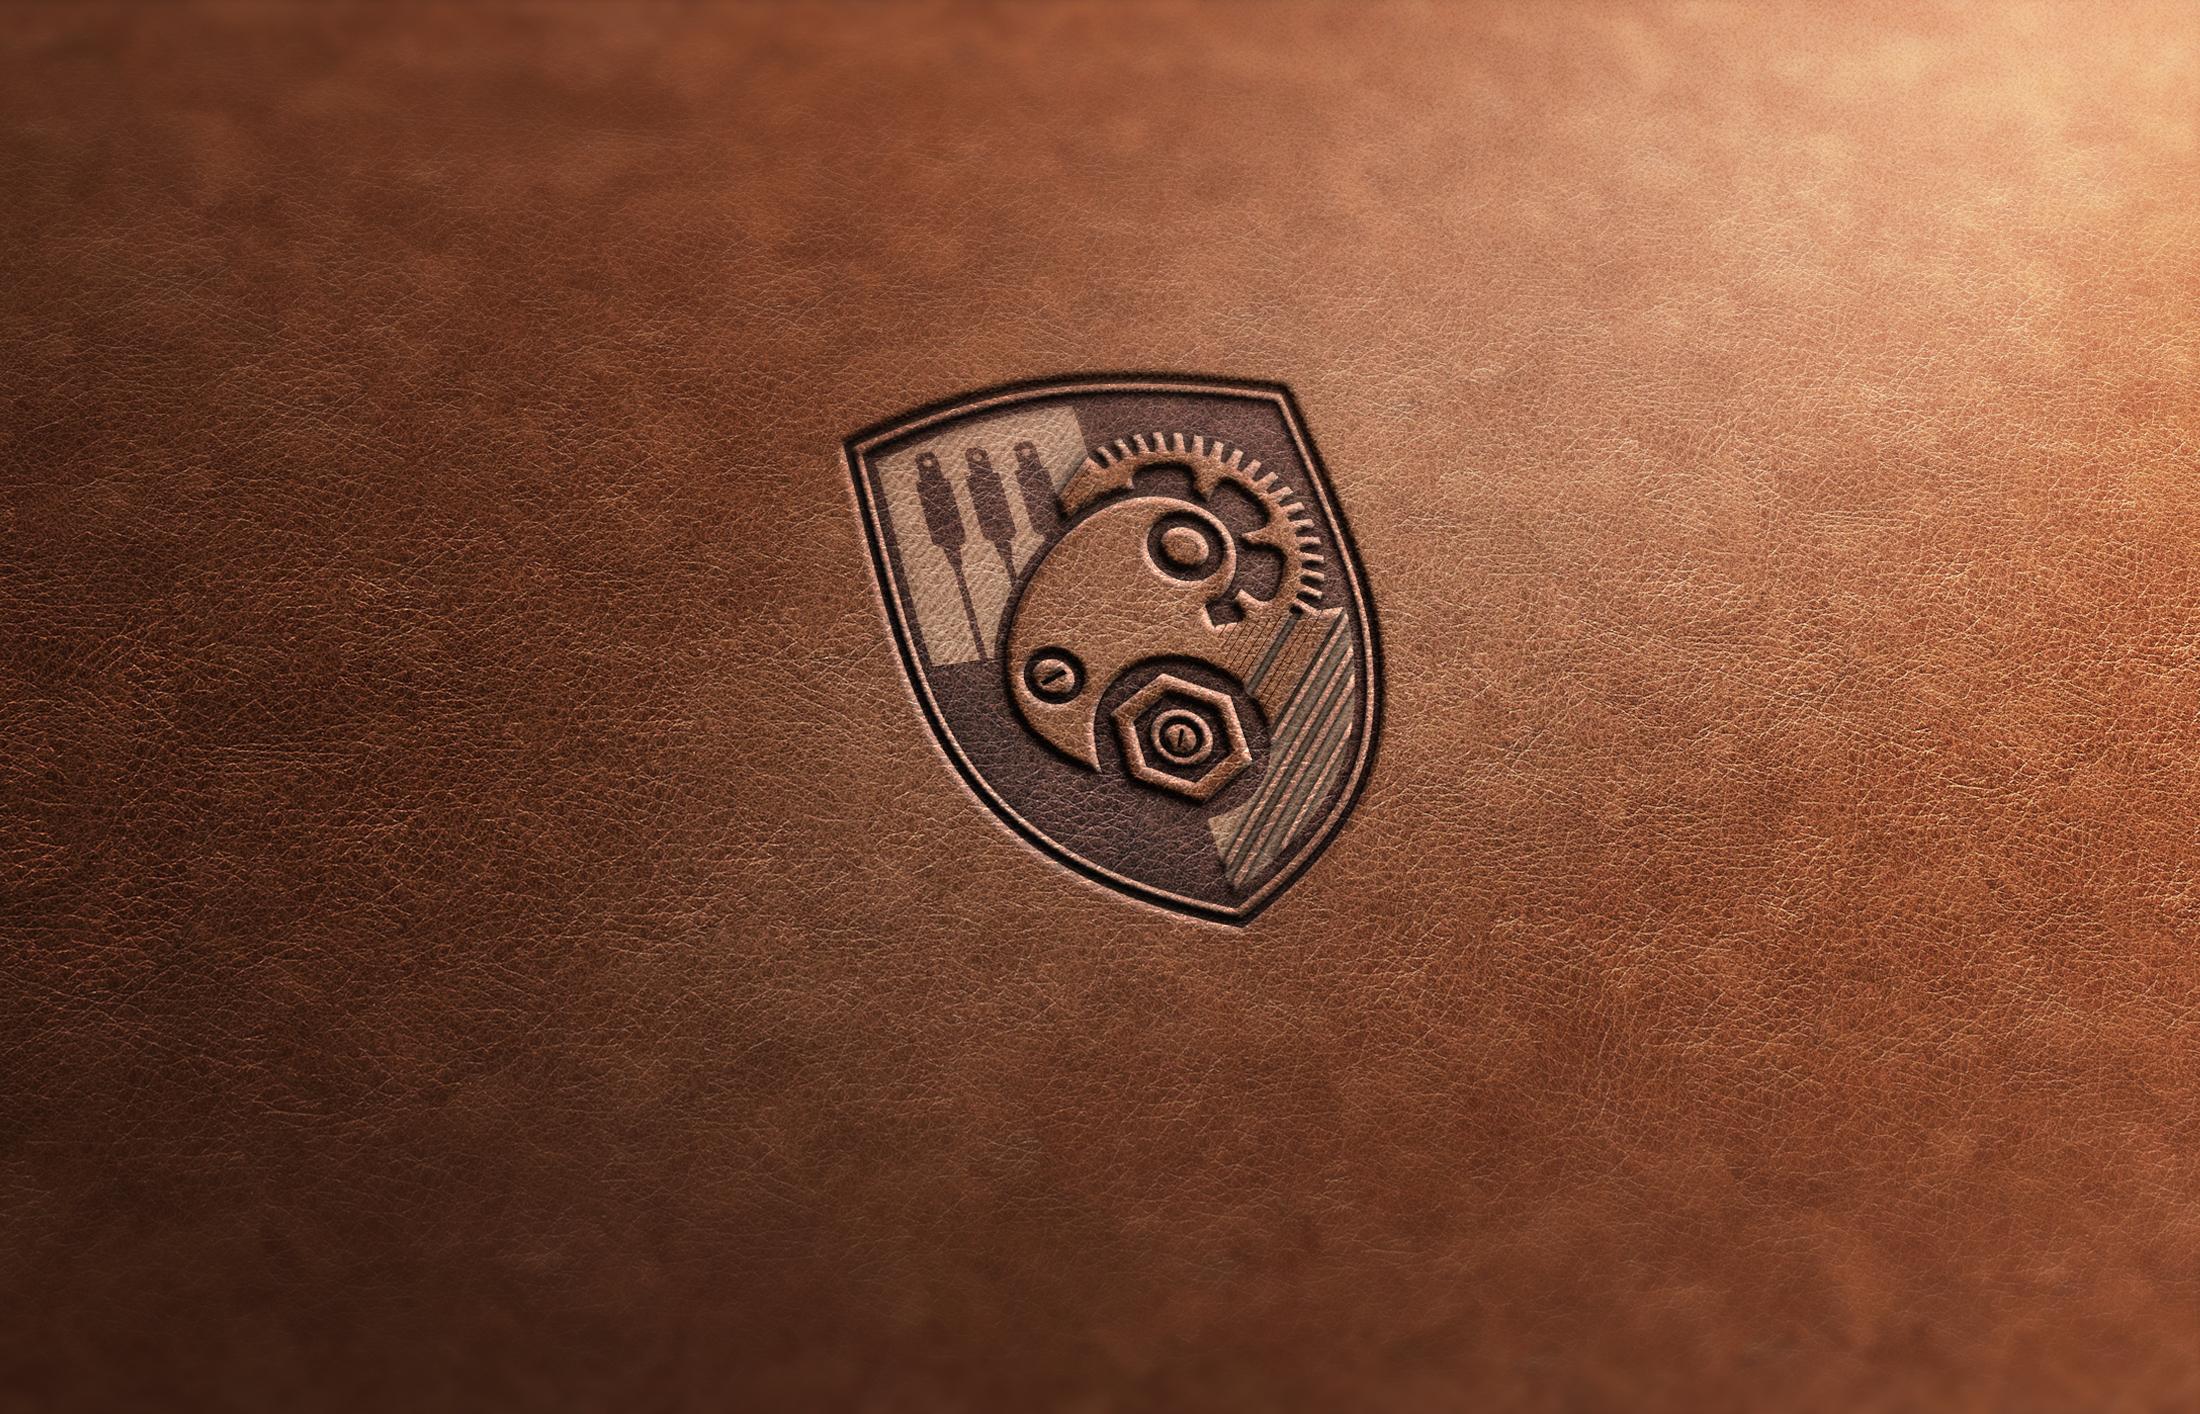 Leather Stamp.jpg